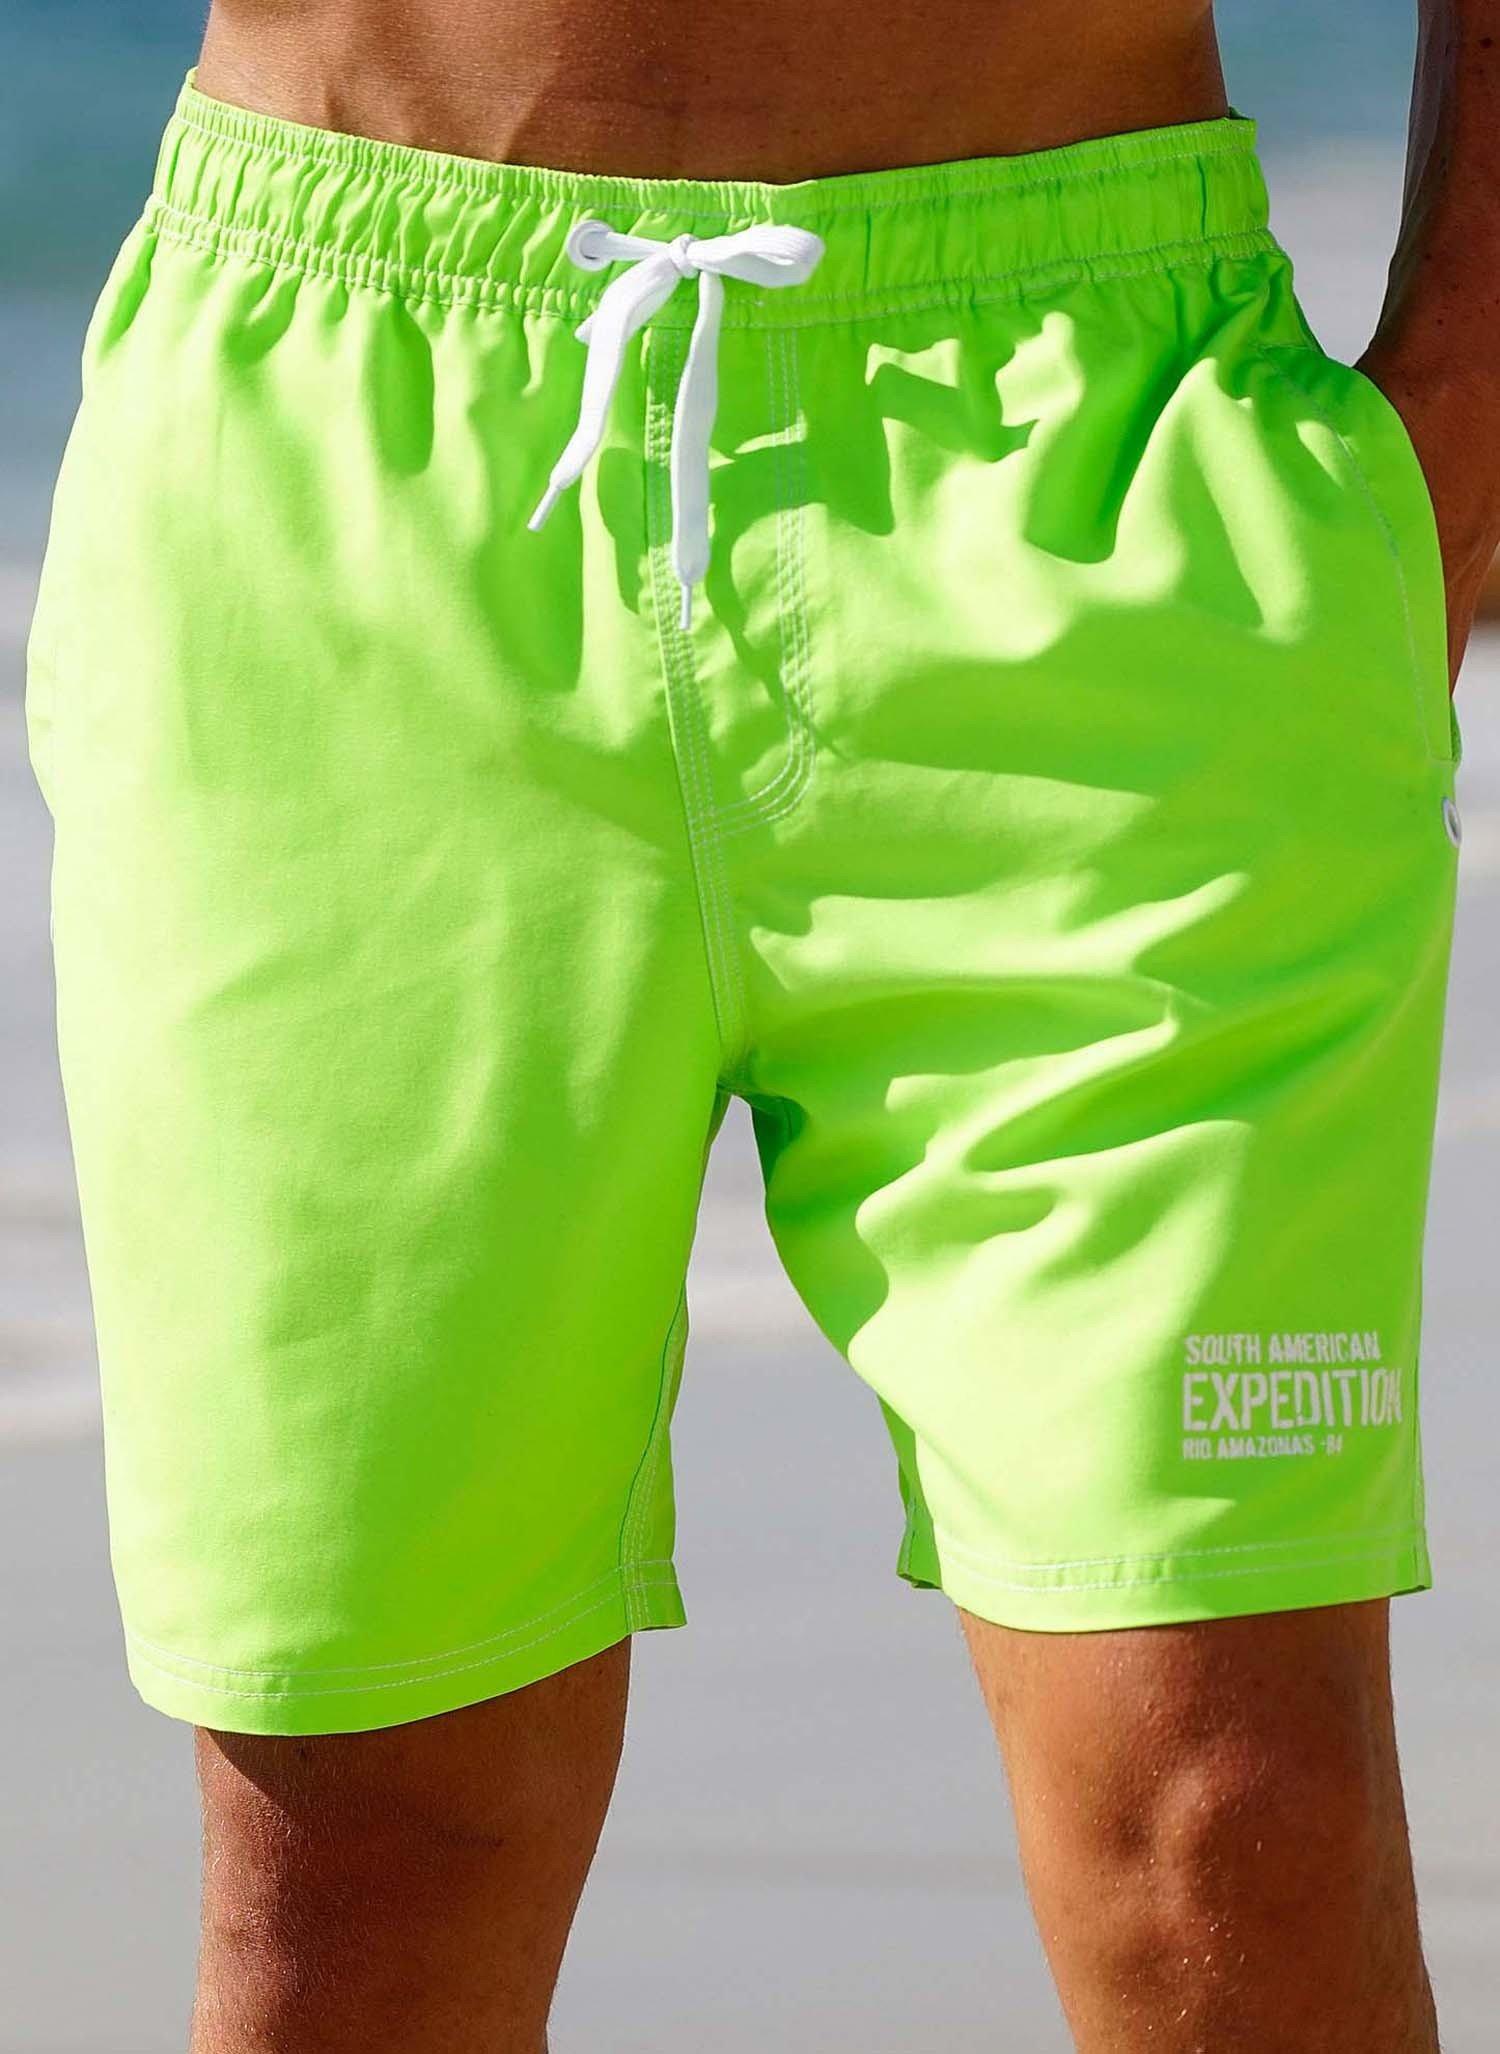 H-Bade-Shorts,NEON grün S 059 - 1 - Ronja.ch